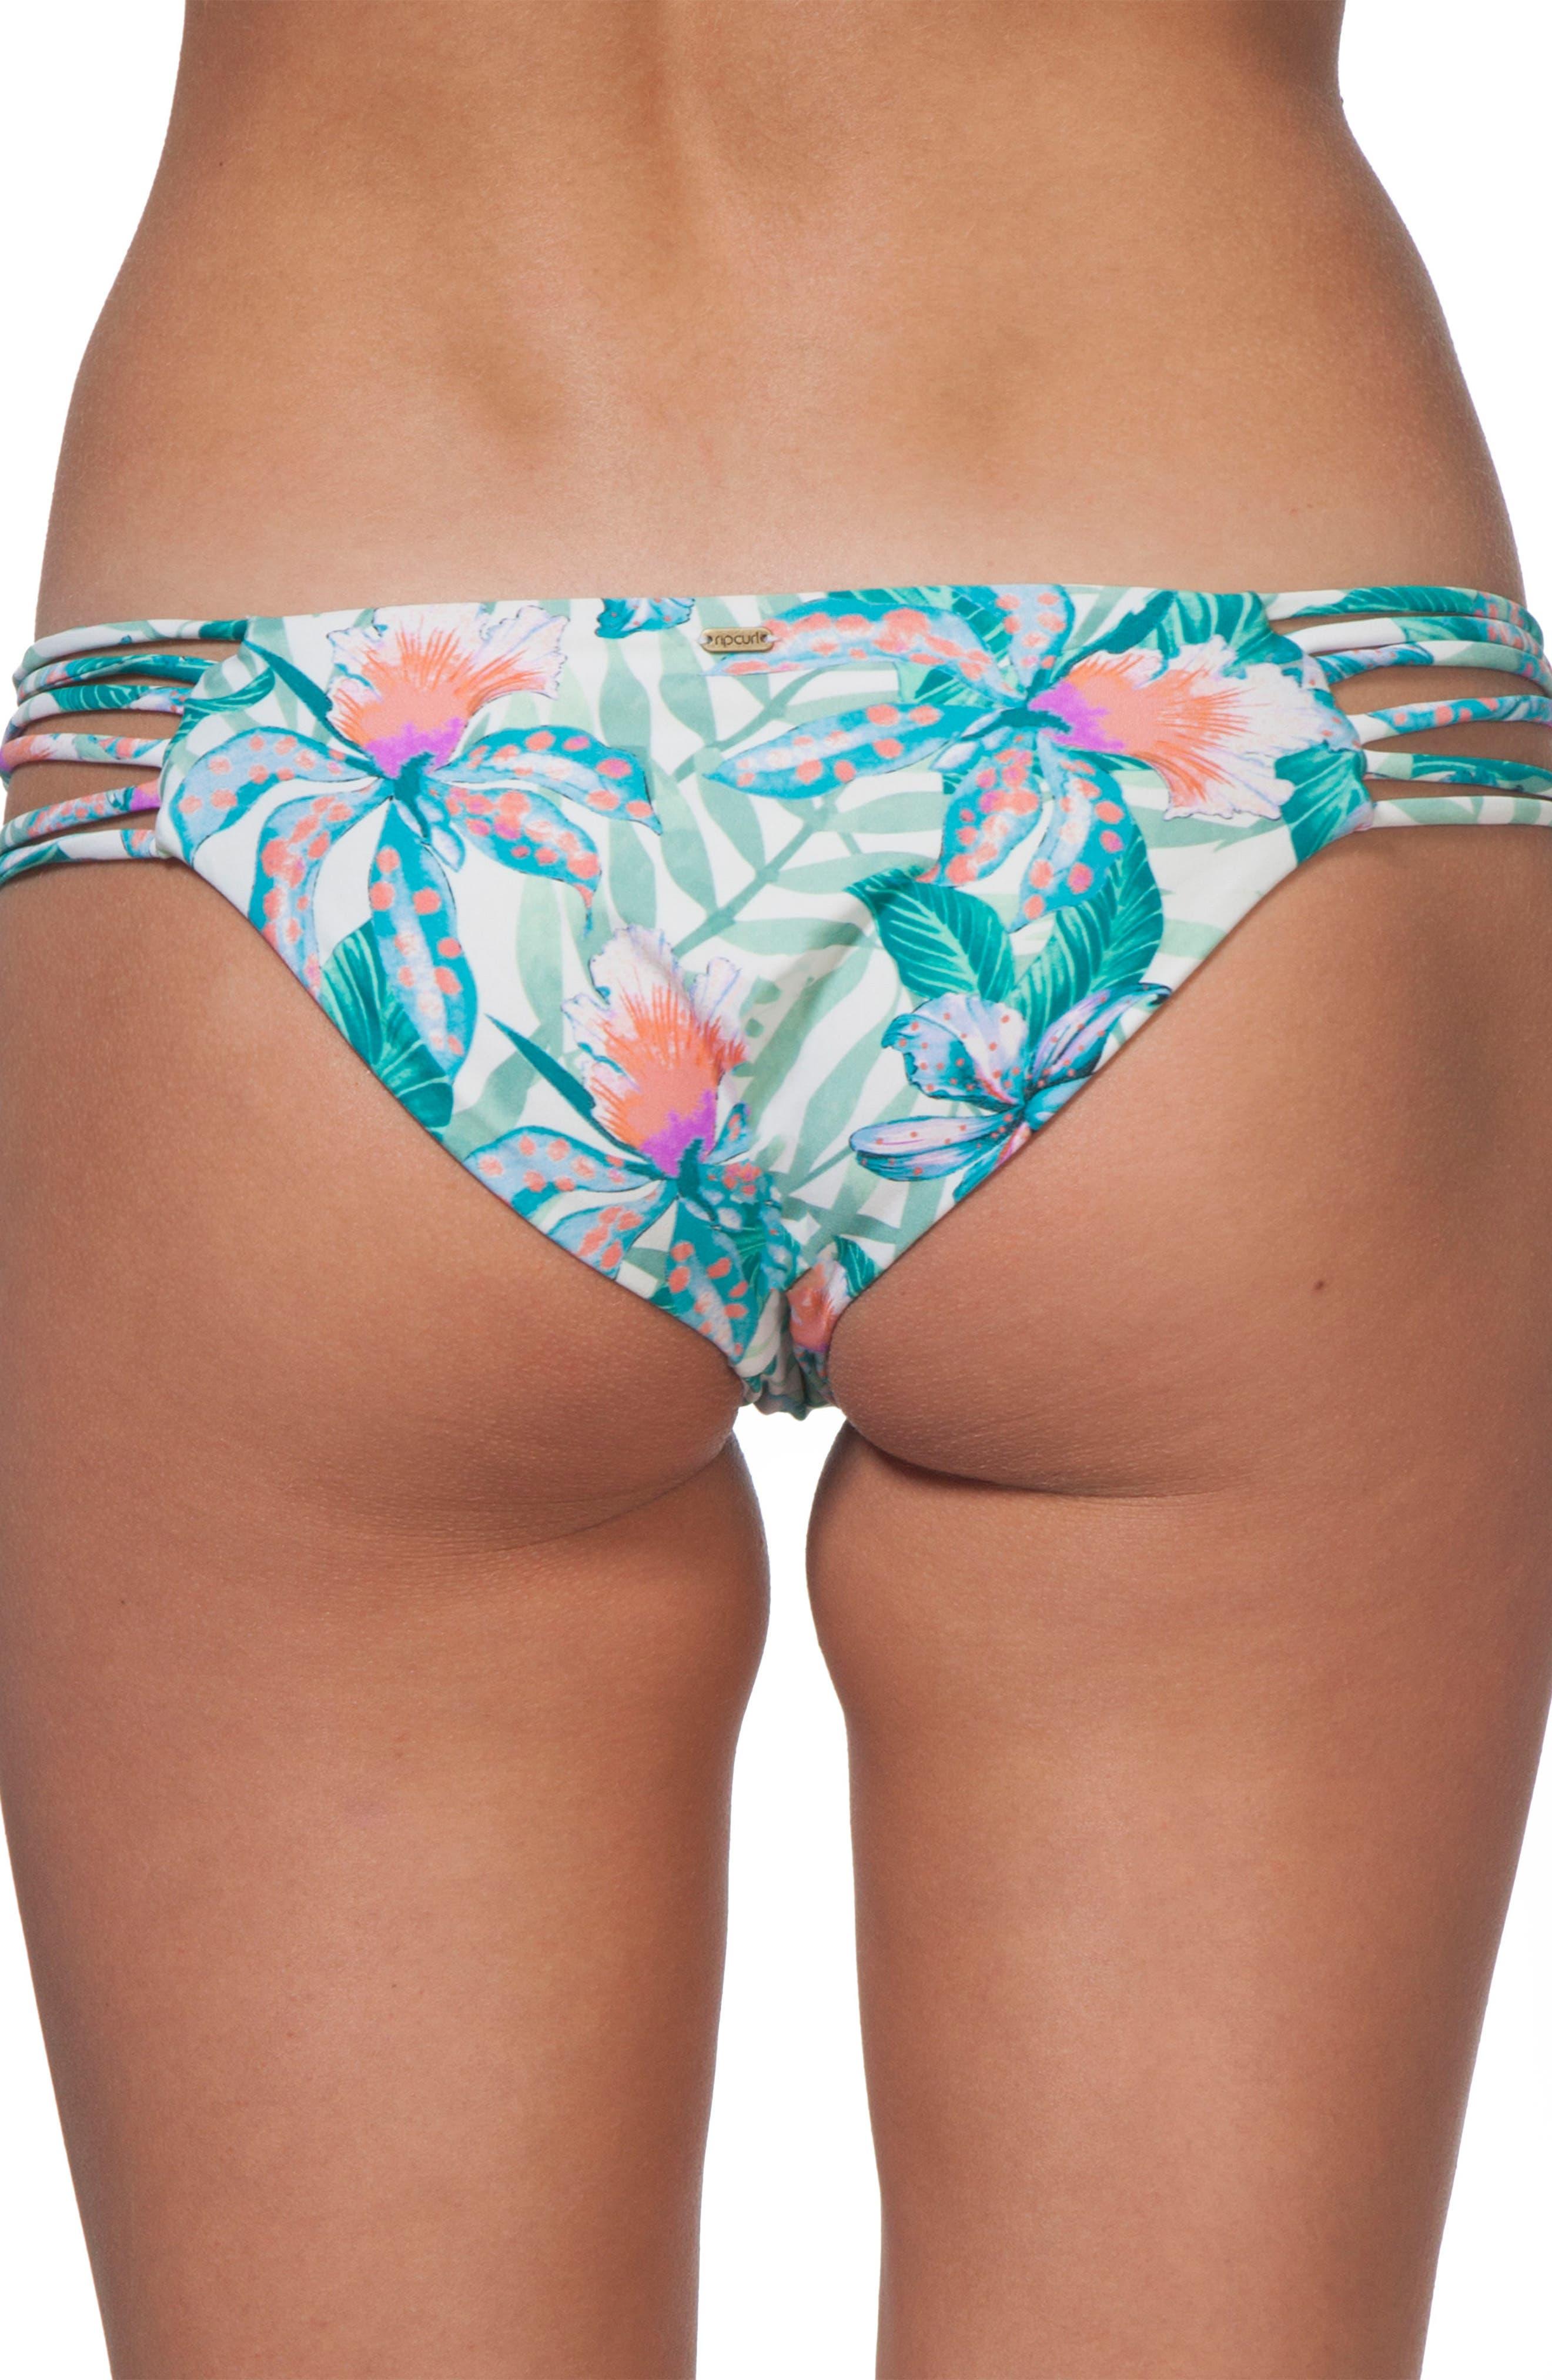 Tropic Tribe Luxe Hipster Bikini Bottoms,                             Alternate thumbnail 2, color,                             White